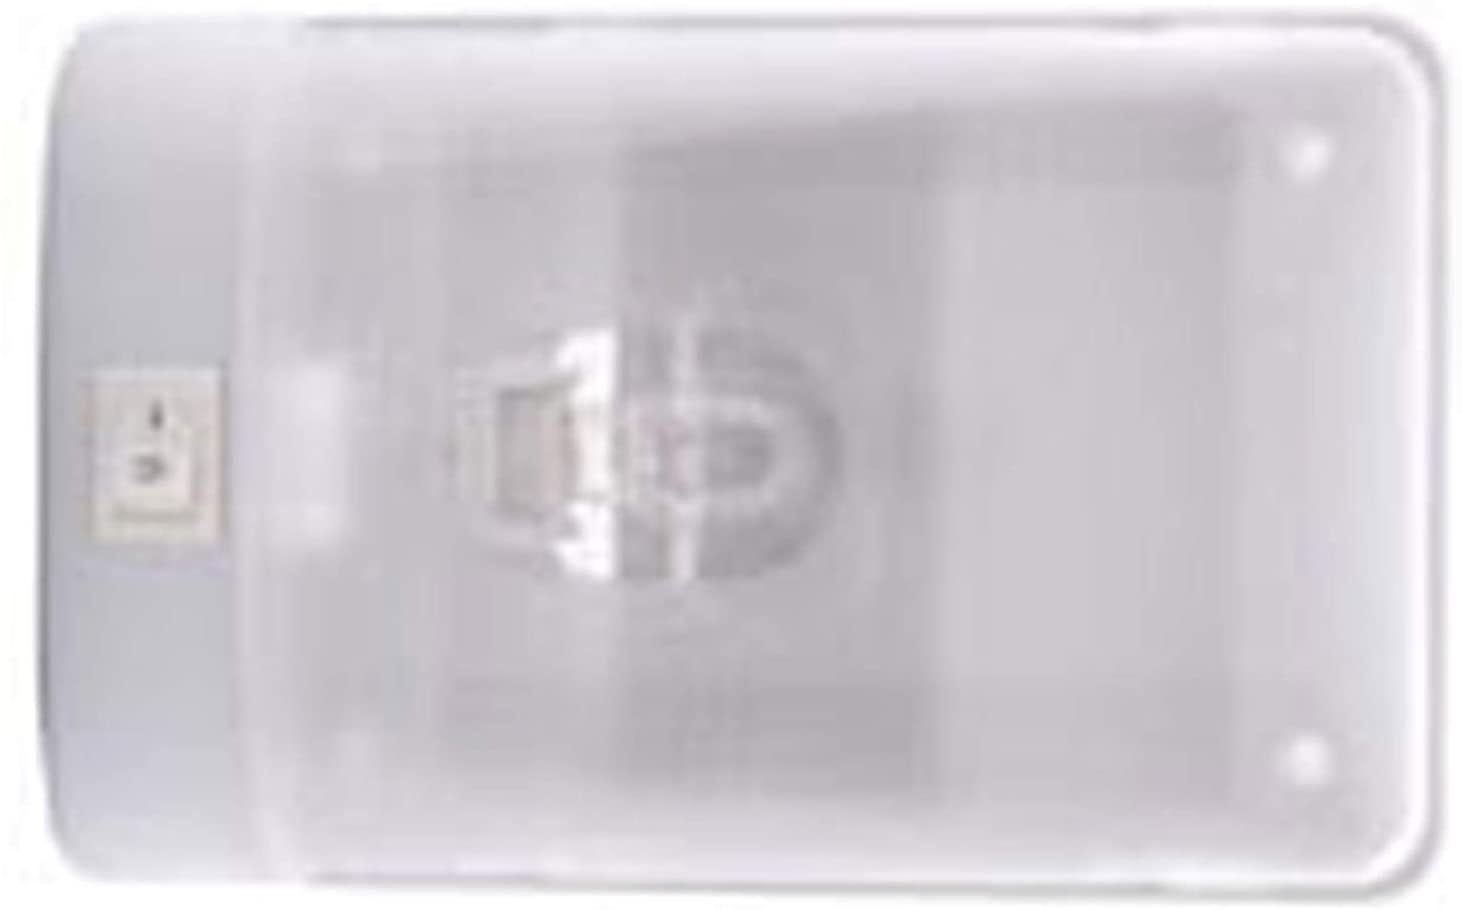 Optronics RVIL21S RV Interior Light - 12